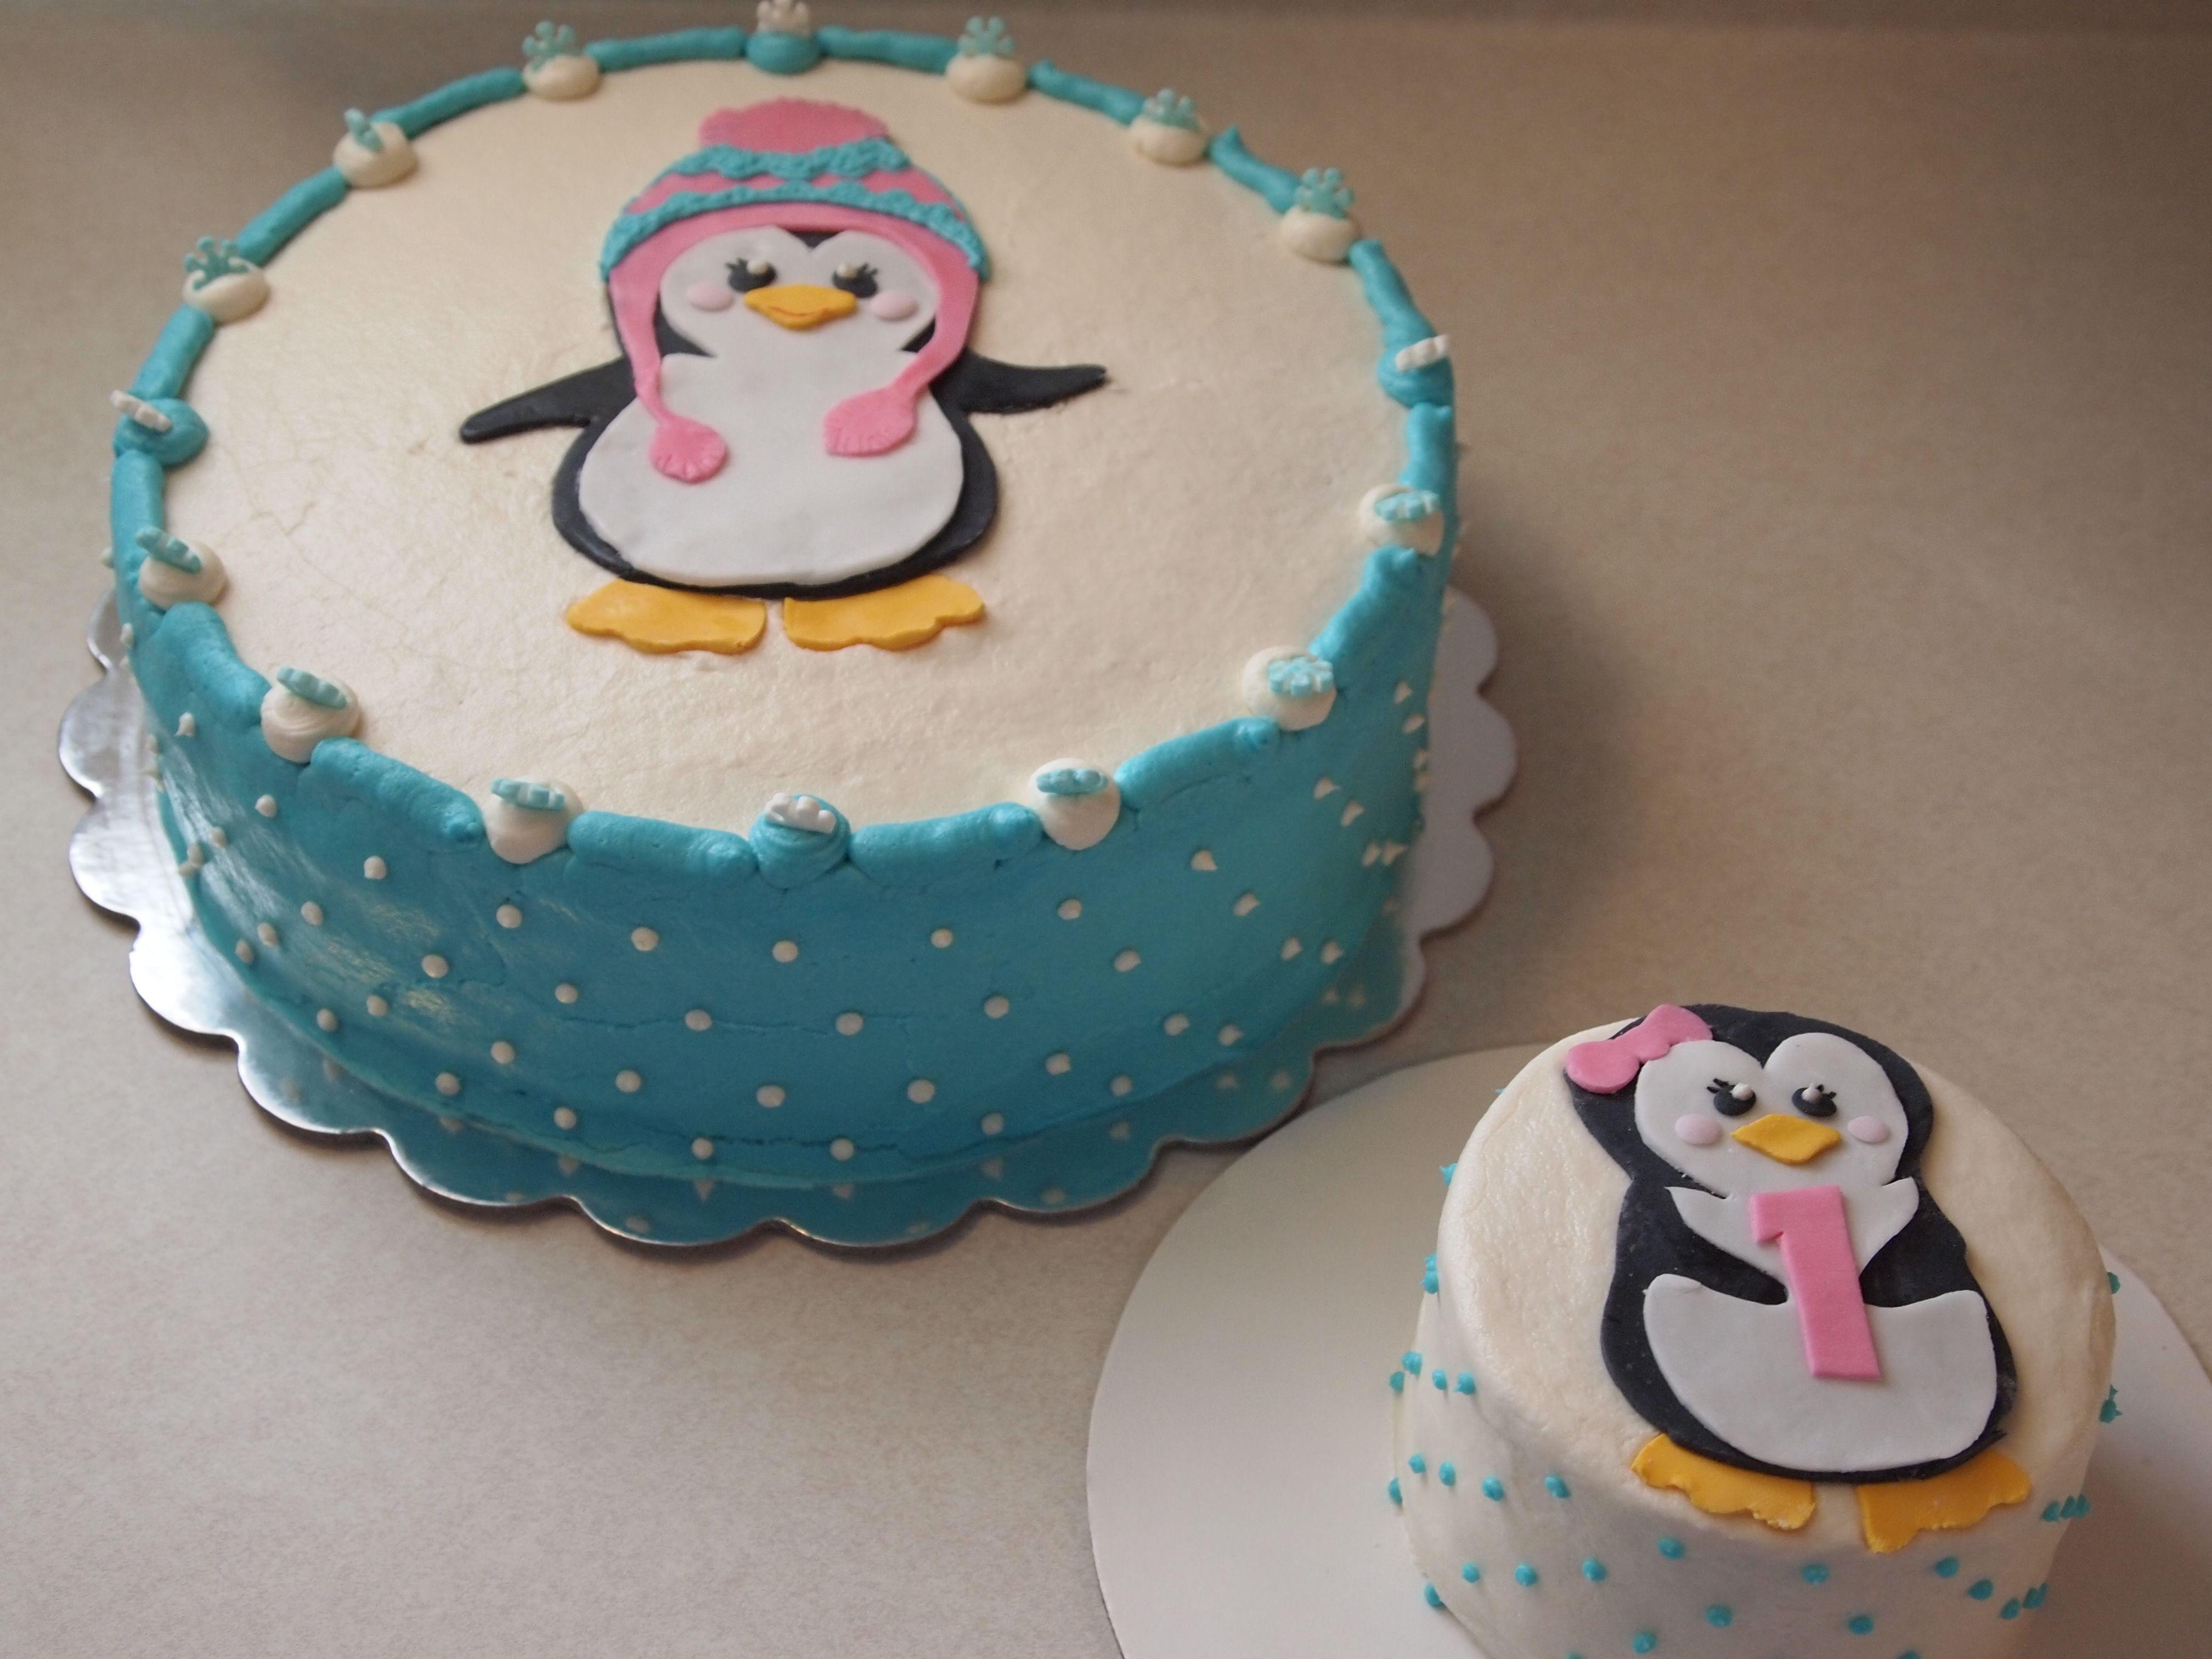 Penguin first birthday cake Birthday party ideas Pinterest